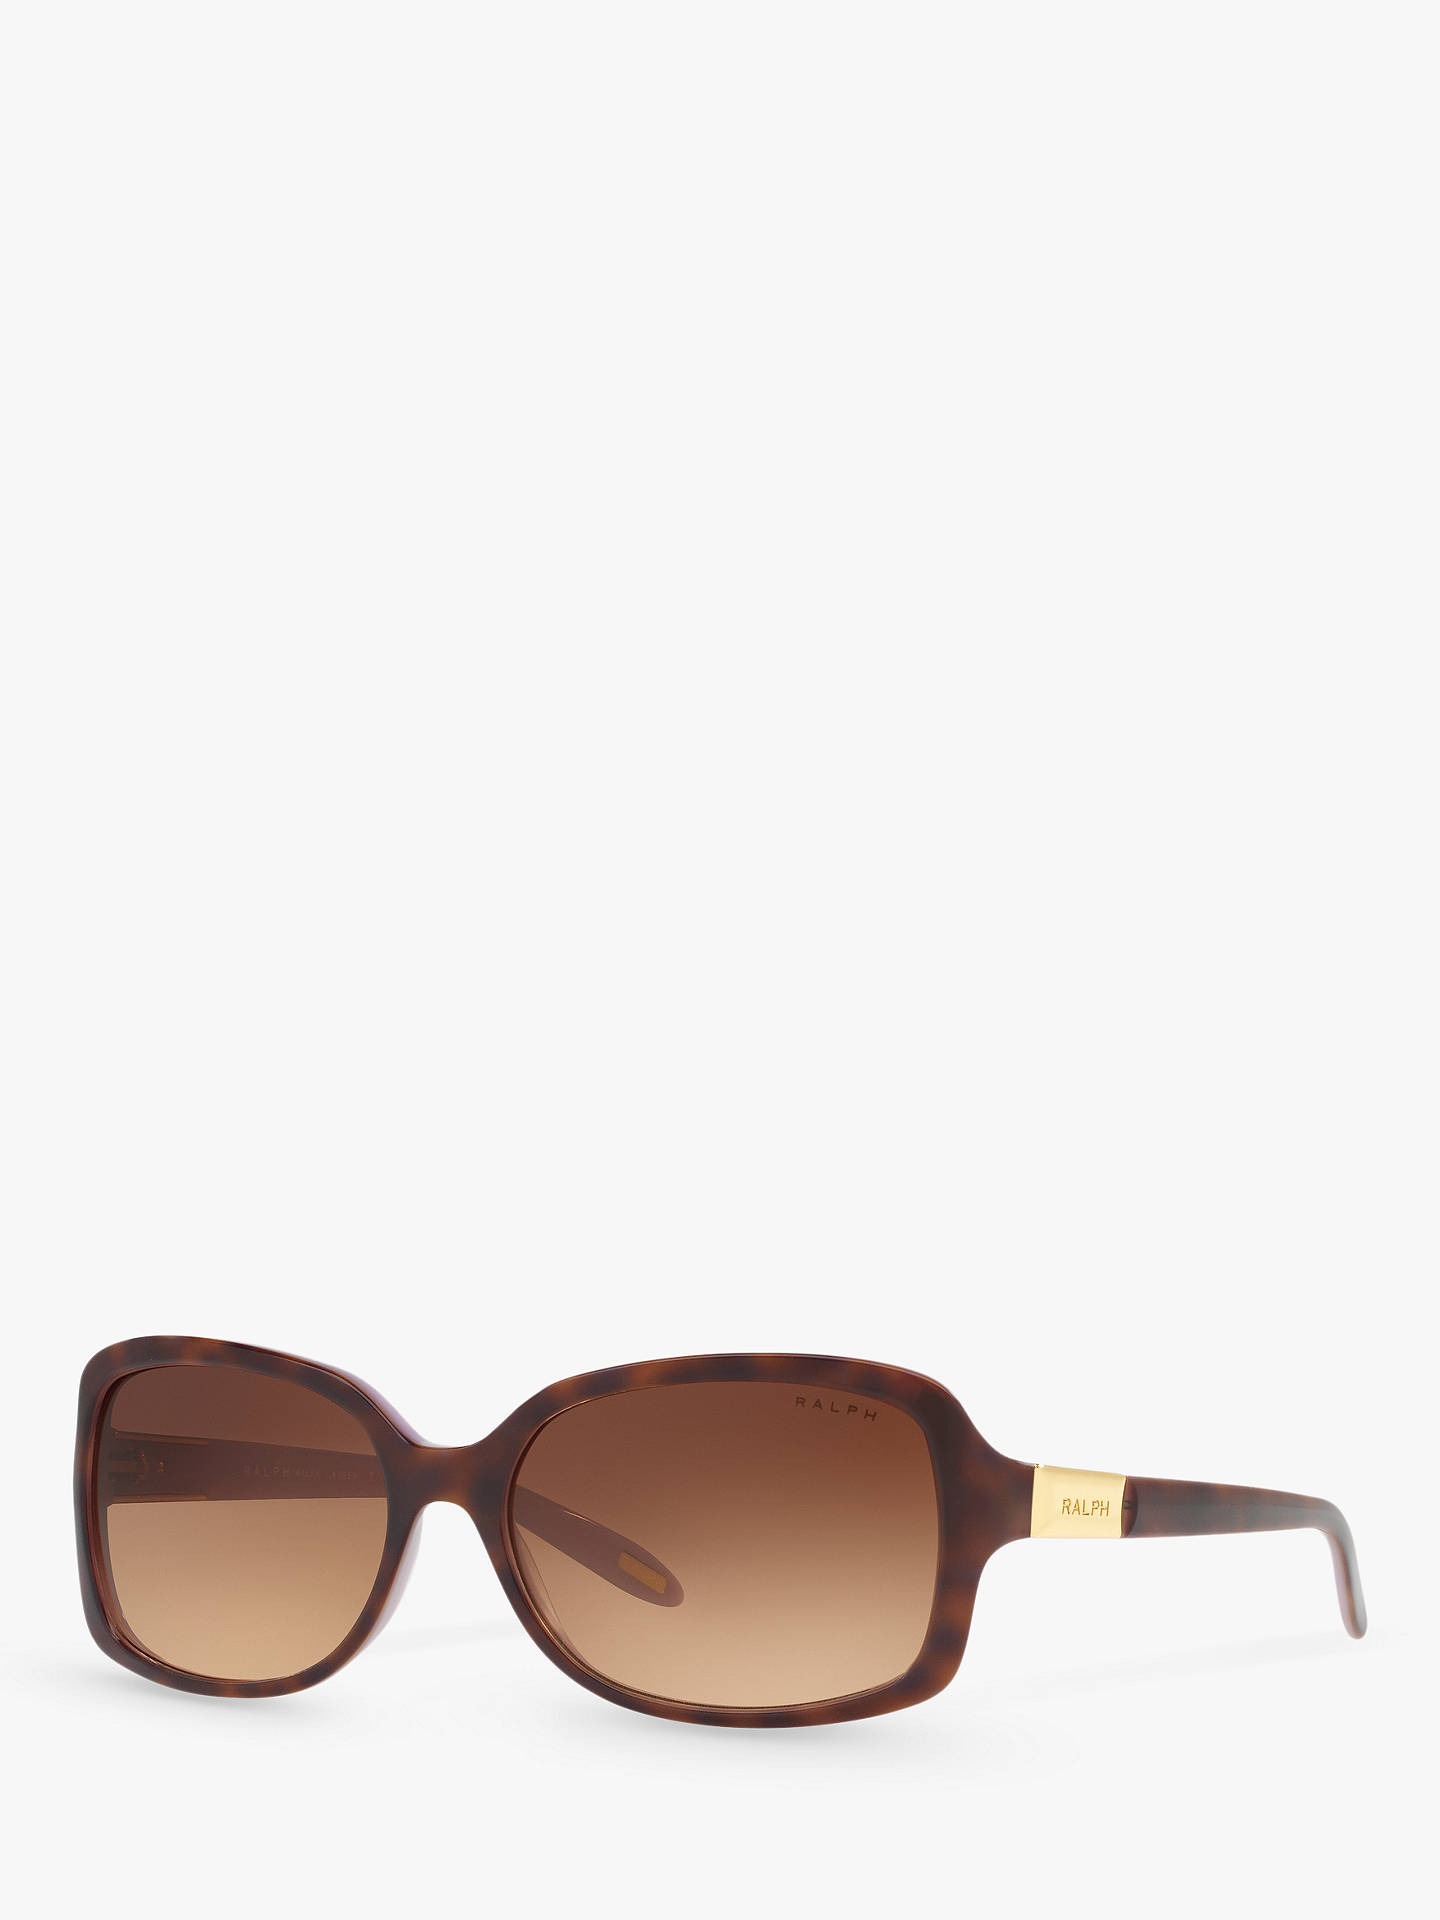 793fa5314b93 Buy Polo Ralph Lauren RA5130 Women's Rectangular Sunglasses,  Tortoise/Violet Online at johnlewis.